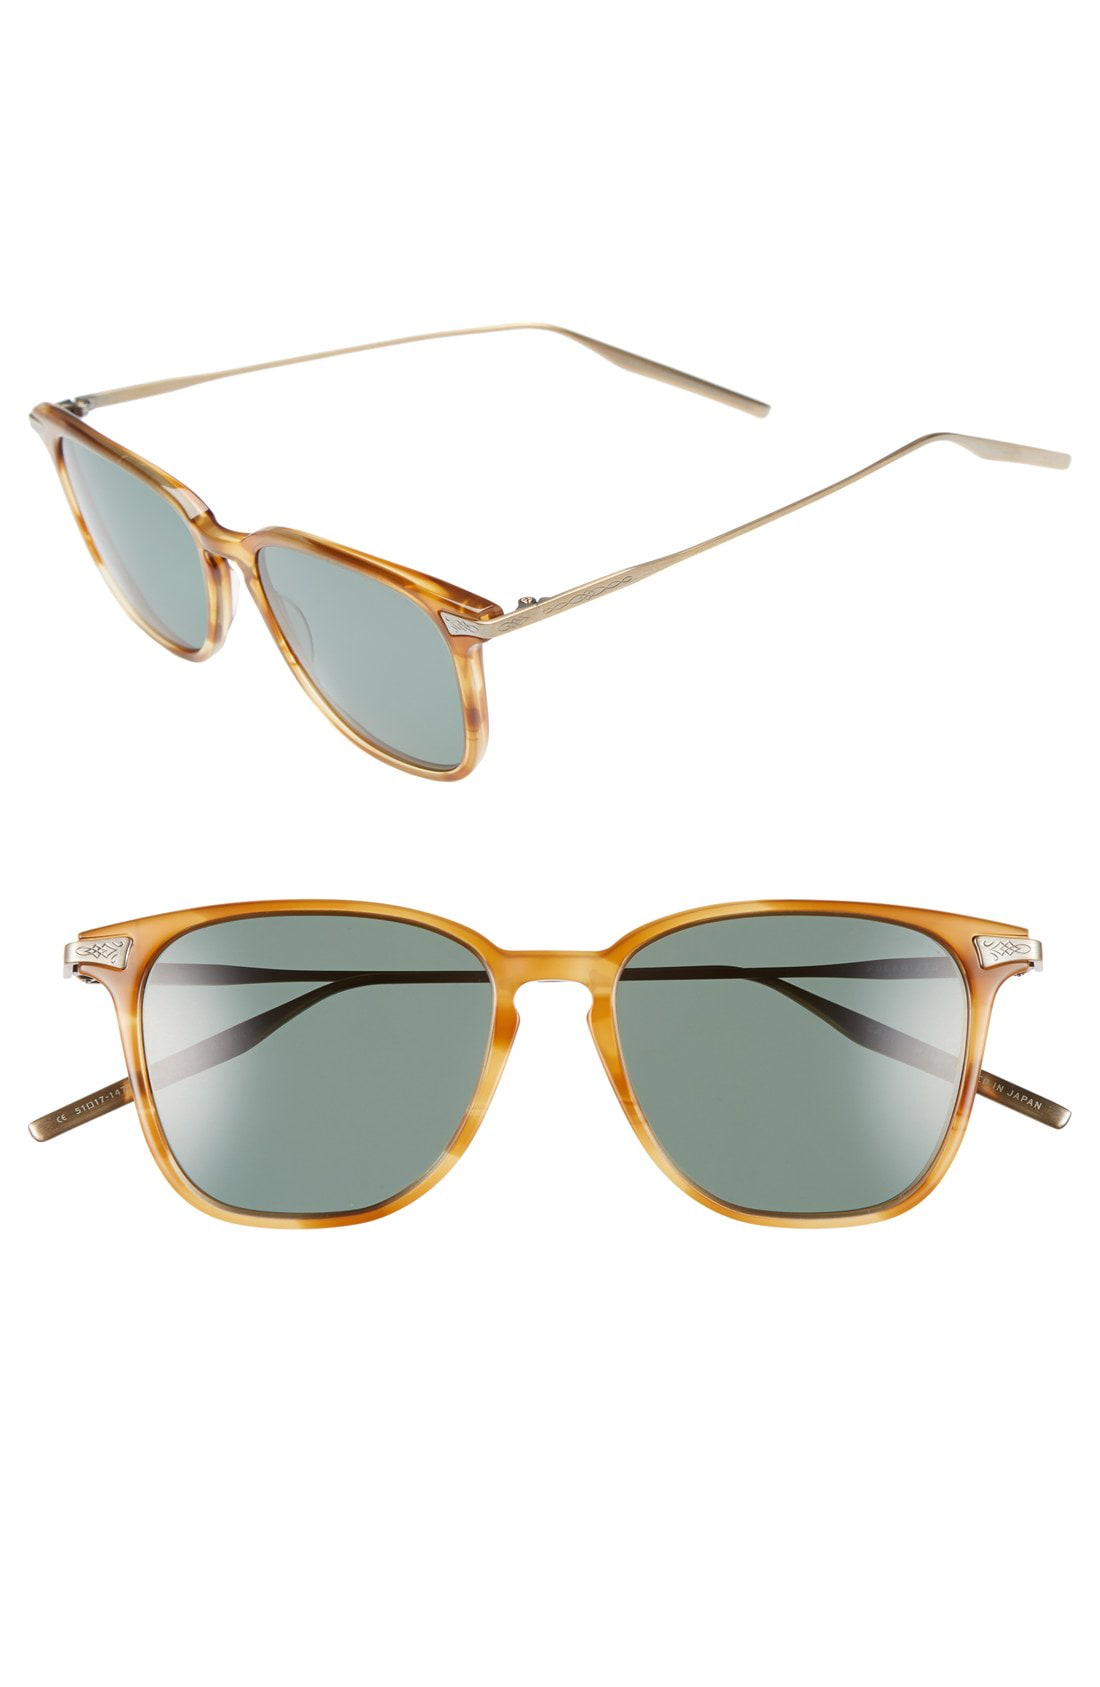 0f9e2226802d4 Salt. Ridgeway 51Mm Polarized Sunglasses - Sienna  Grey